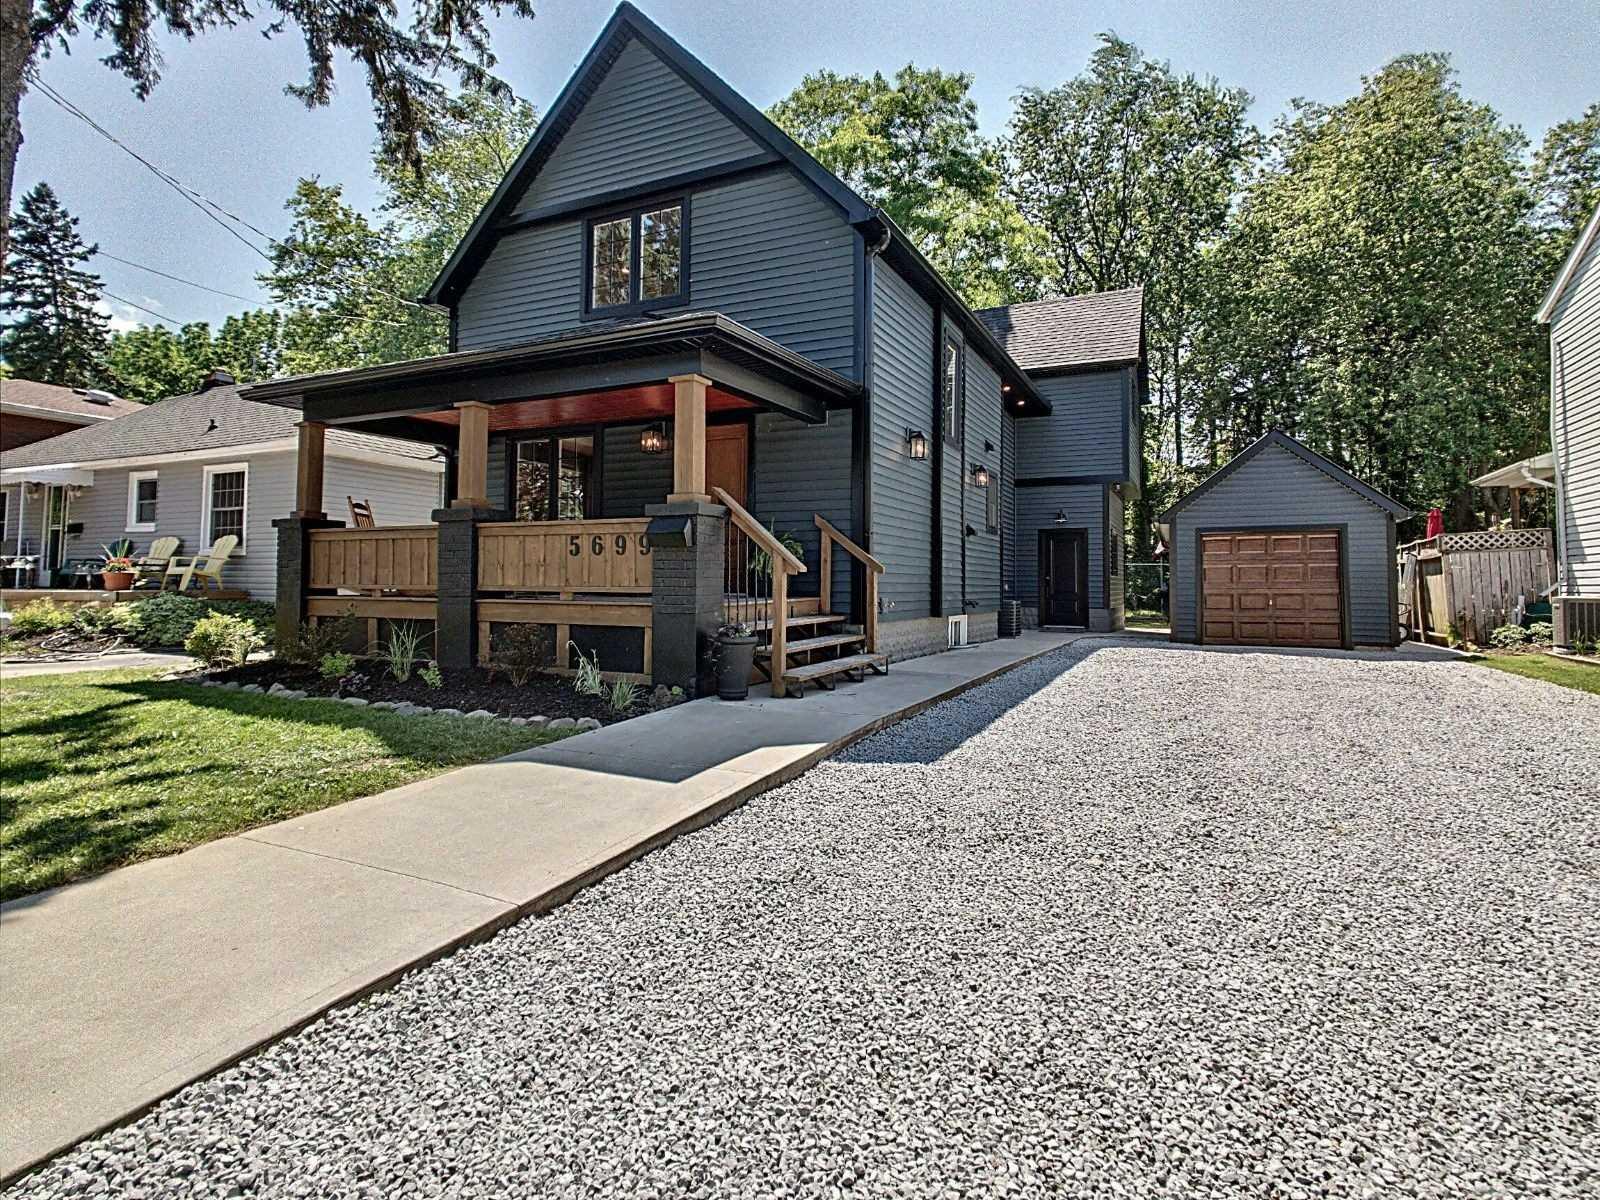 5699 Brookfield Ave, Niagara Falls, Ontario L2G5P9, 4 Bedrooms Bedrooms, ,3 BathroomsBathrooms,Detached,For Sale,Brookfield,X5272642